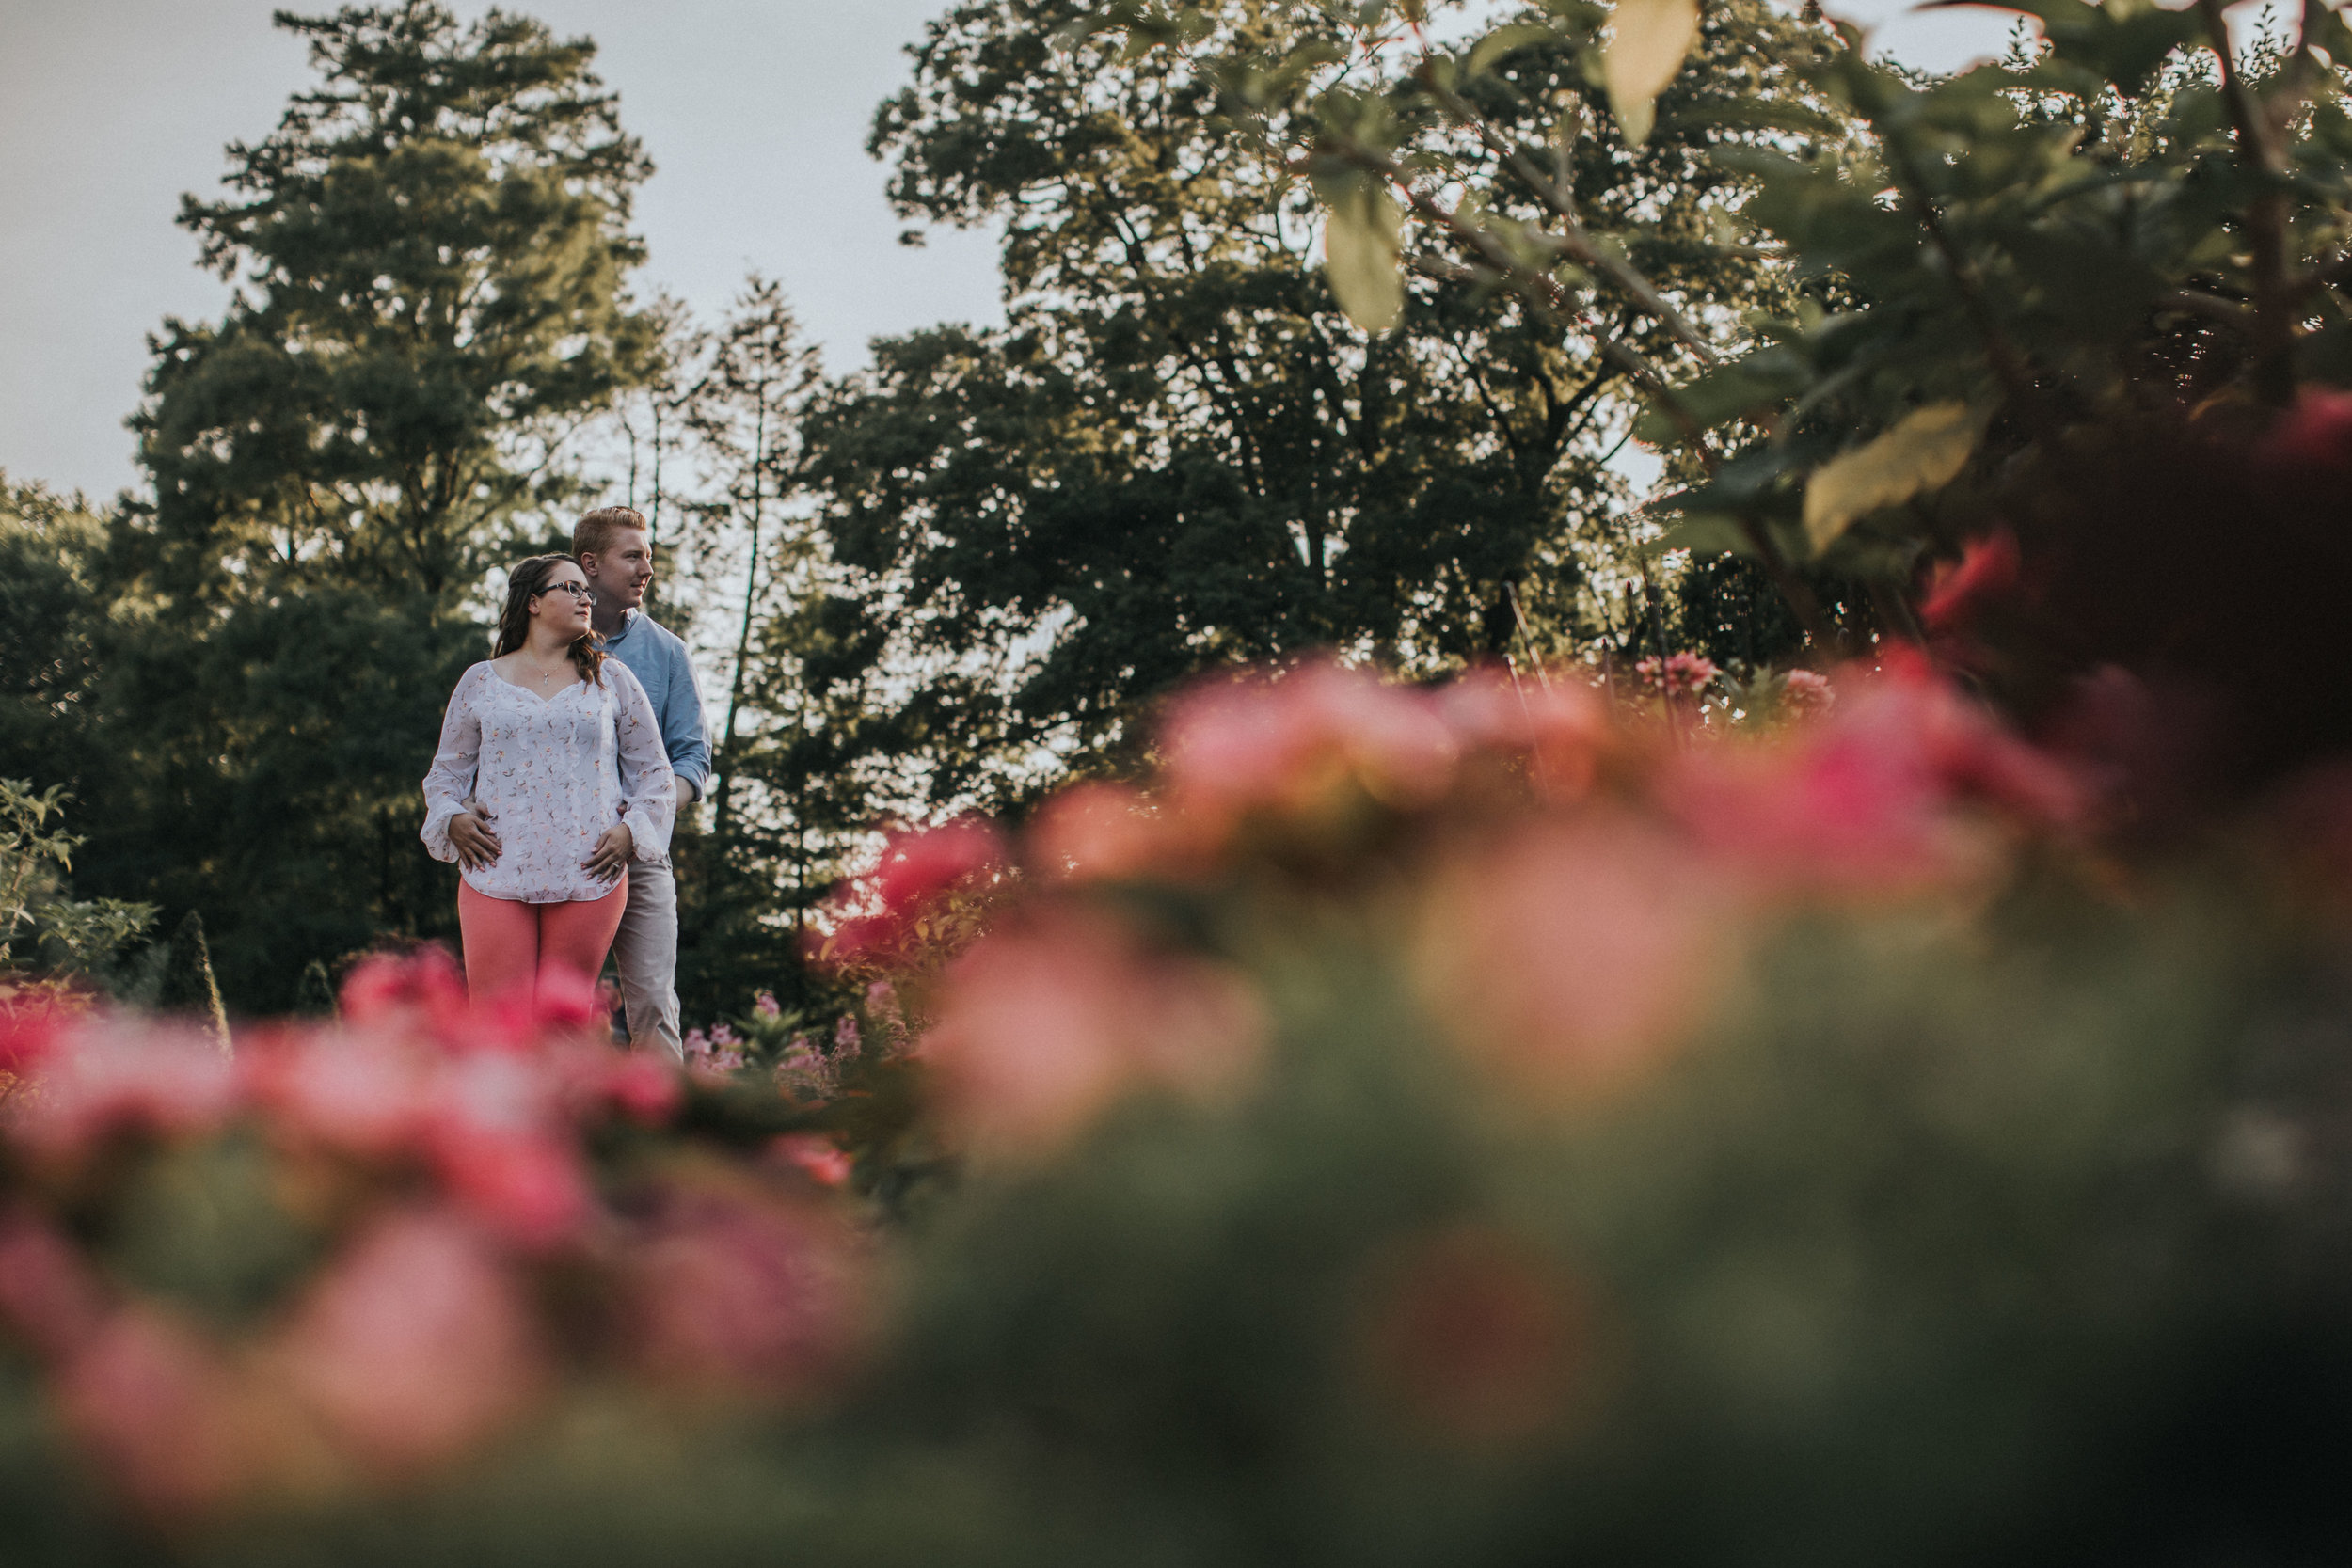 NewJersey_Wedding_Photography_Philadelphia_Longwood_Gardens_Engagement_Kathleen&Eddie-16.jpg